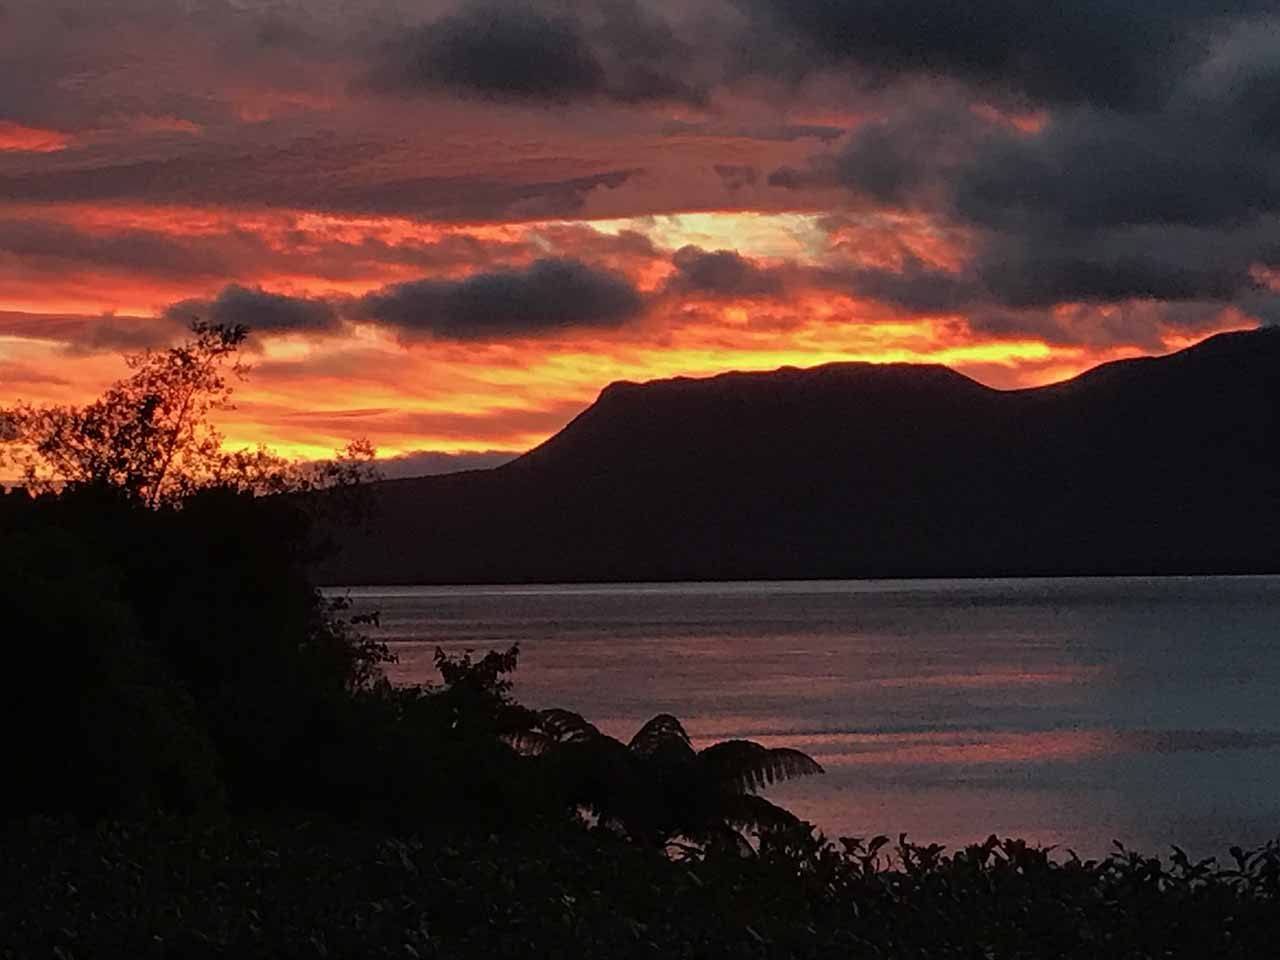 Evening sky view of the tarawera lake nz